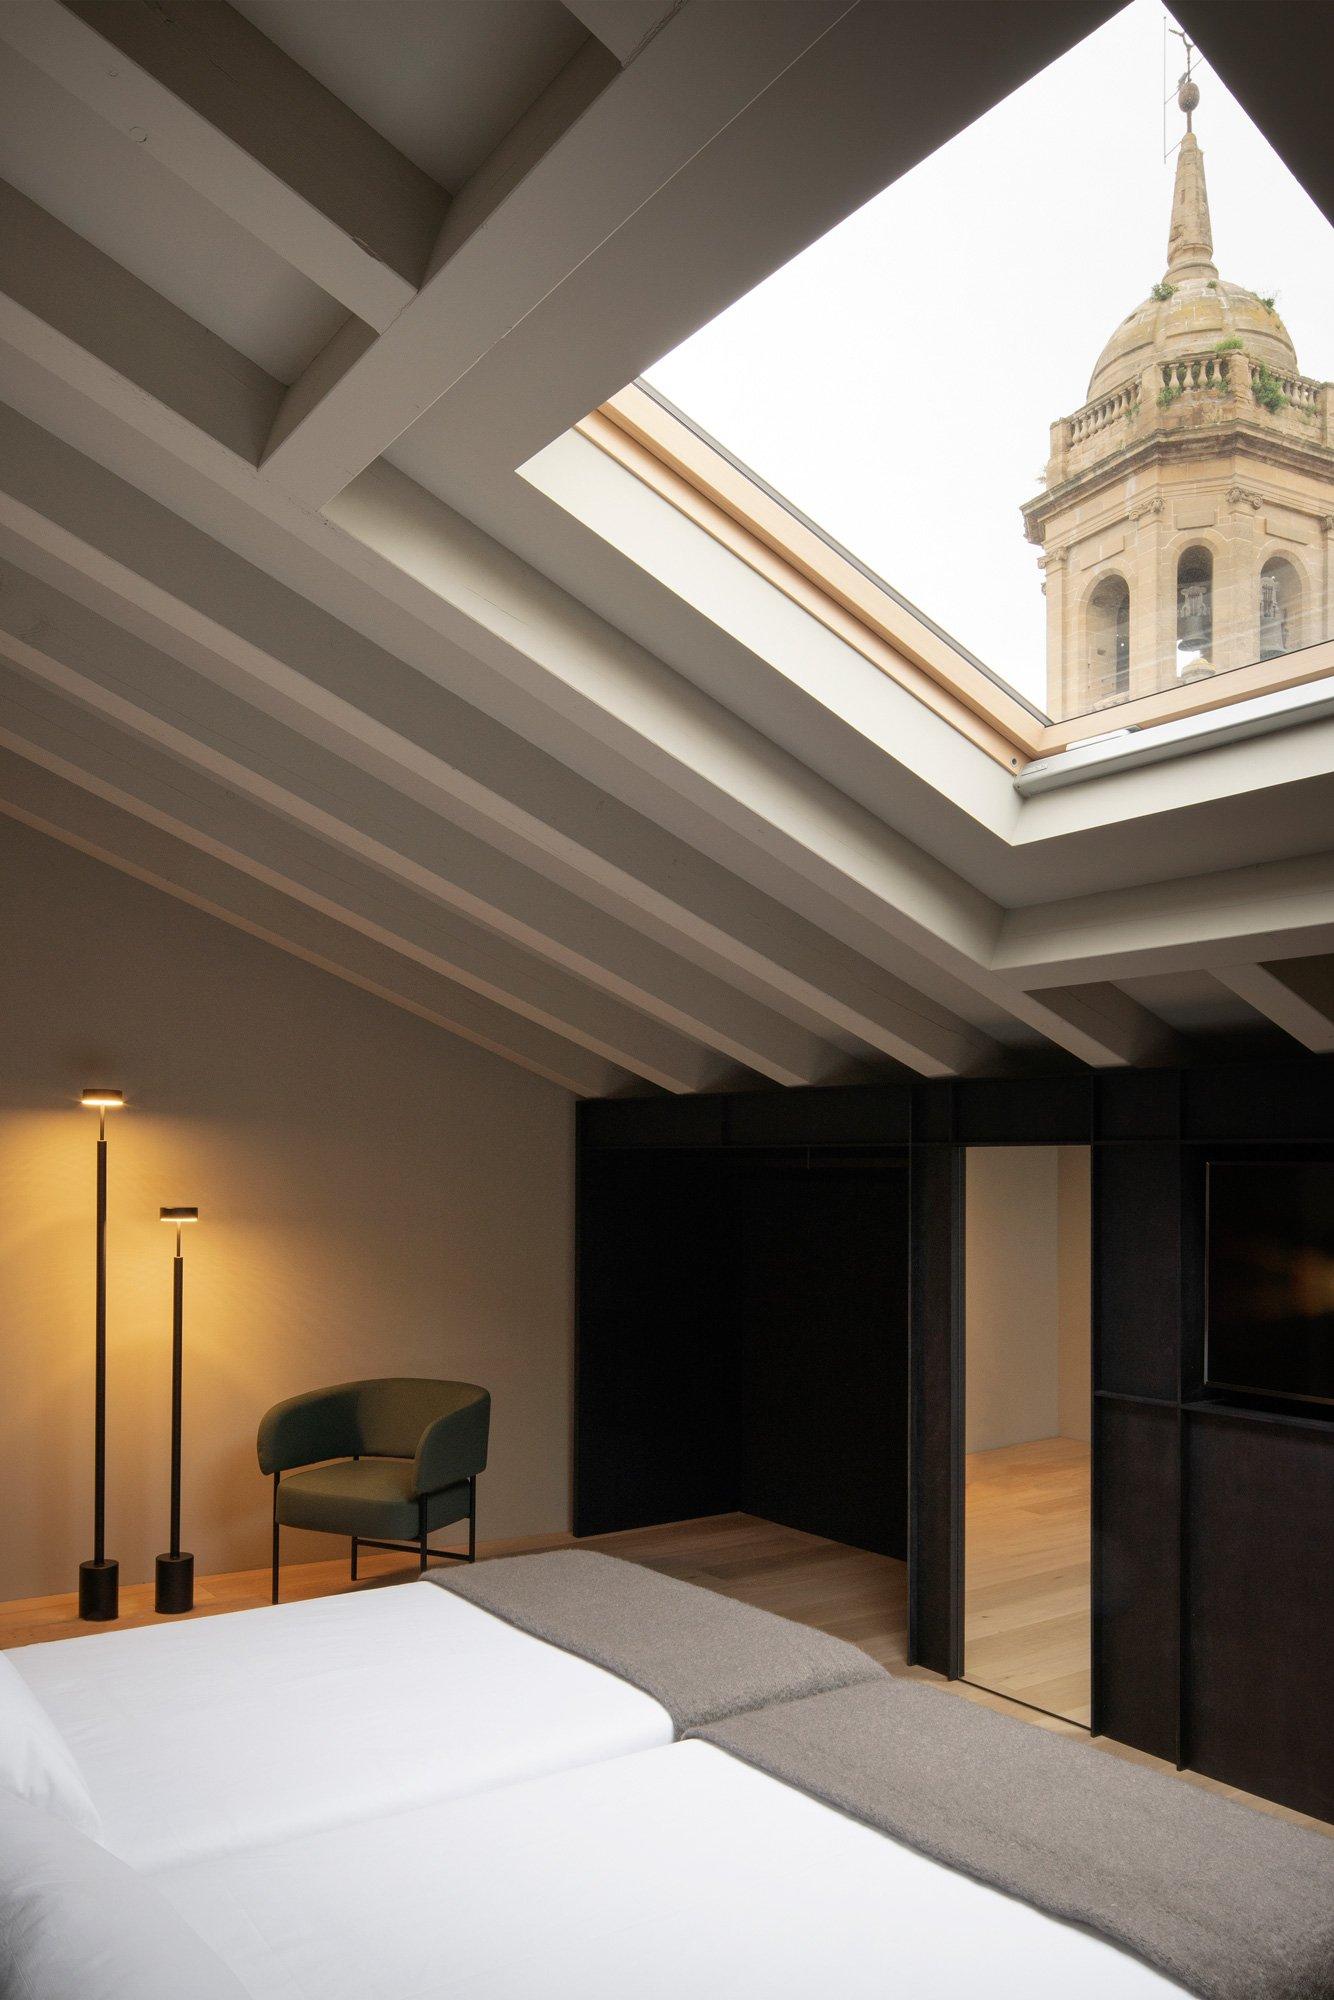 Hotelumbau in Spanien von Francesc Rifé Studio